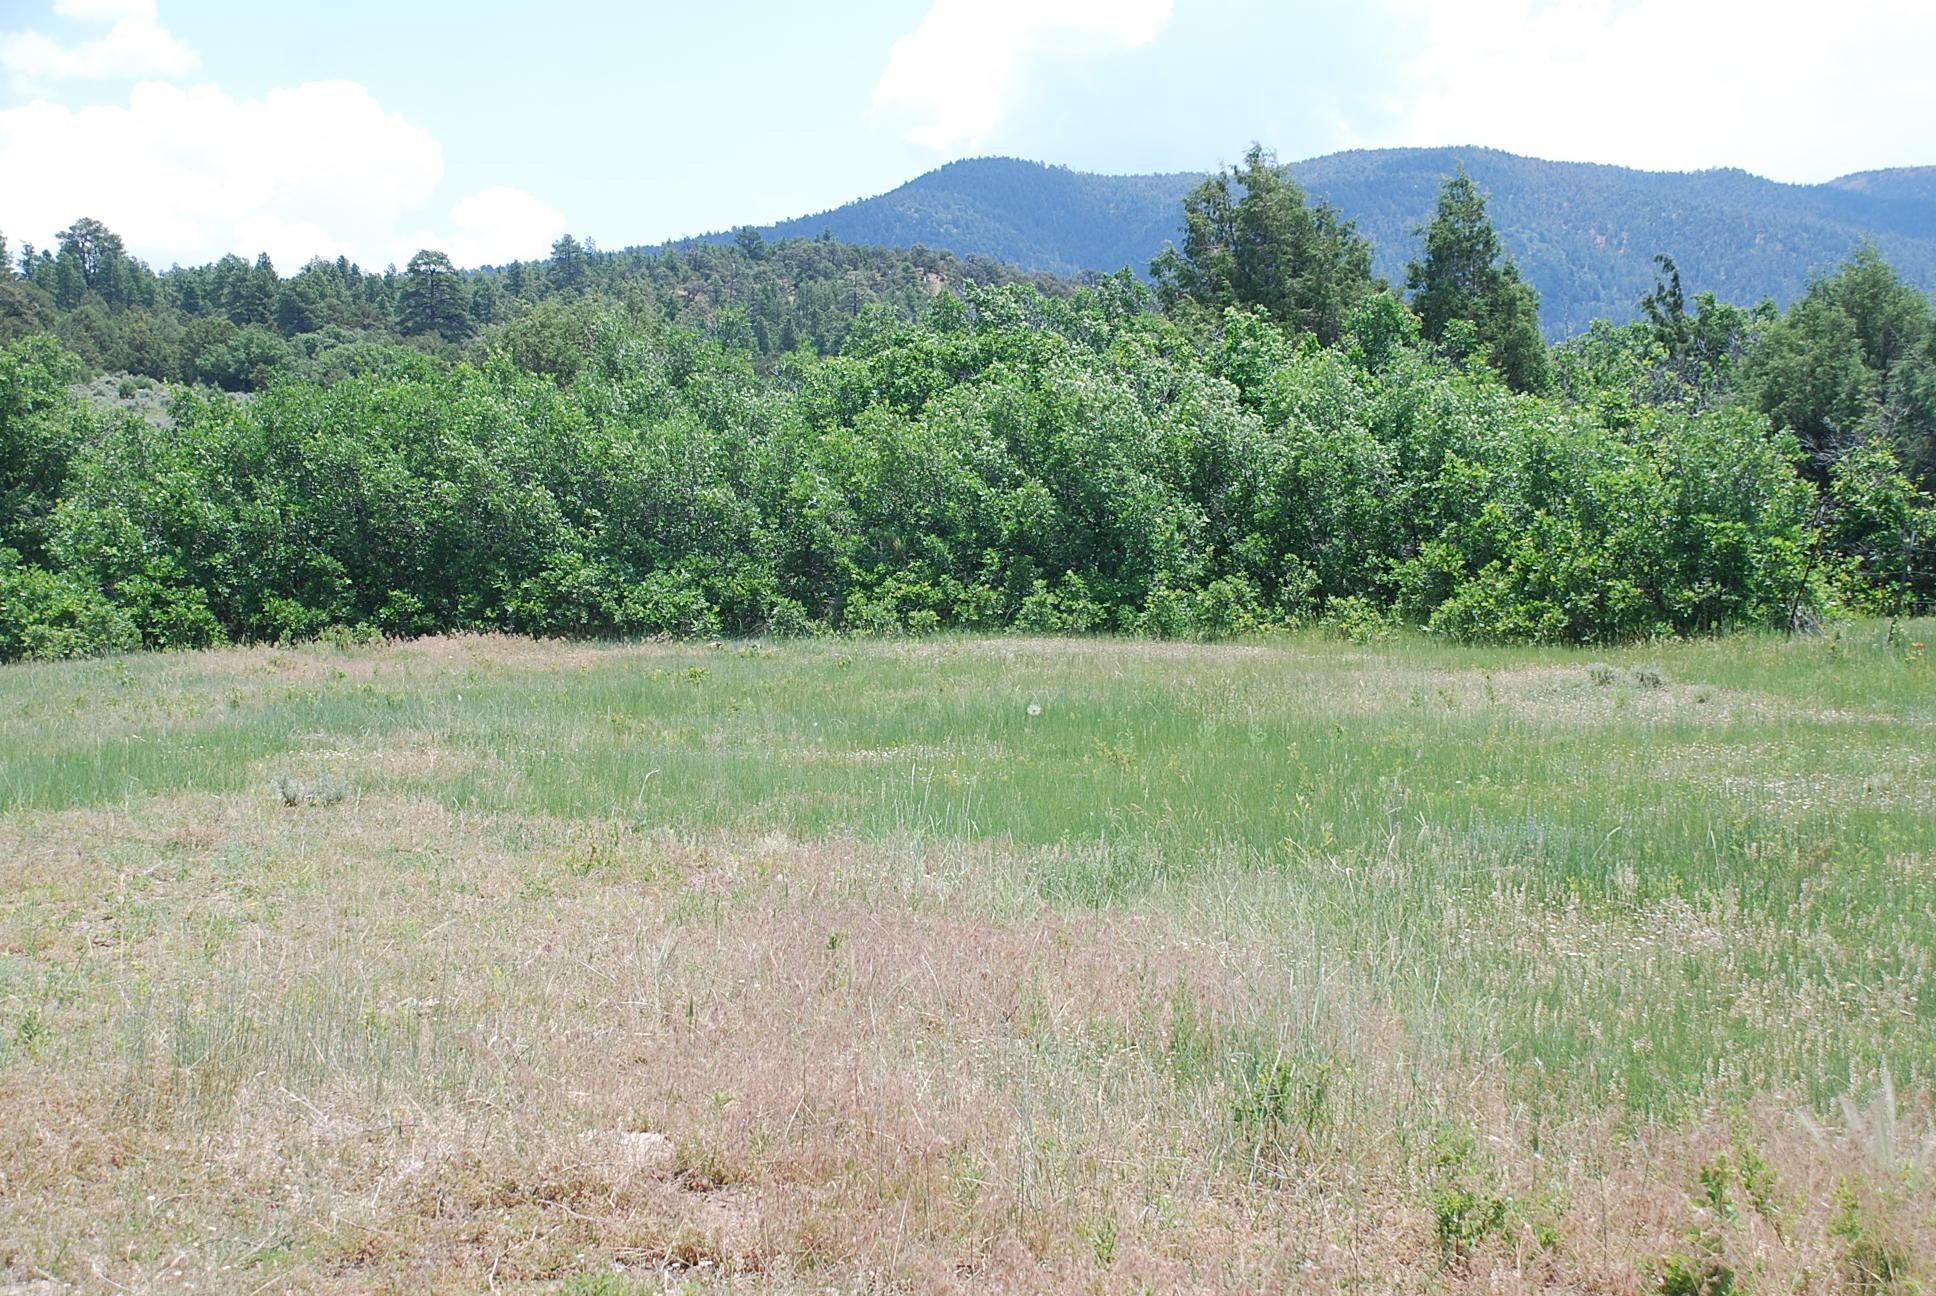 933 Bear Paw Rd., Bear Paw Ranch Property Photo 13